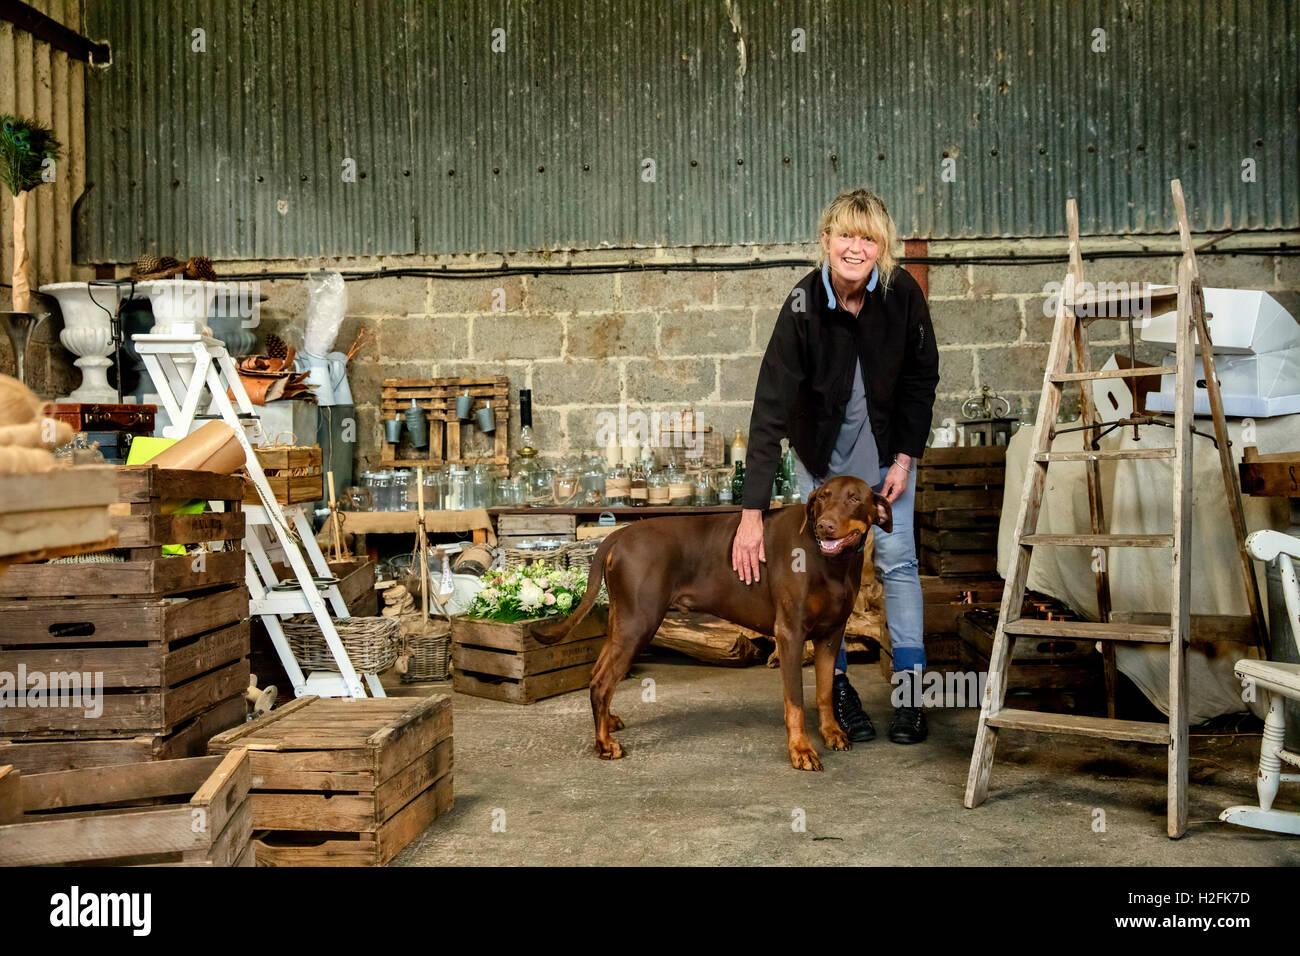 A woman patting a large brown pet dog - Stock Image